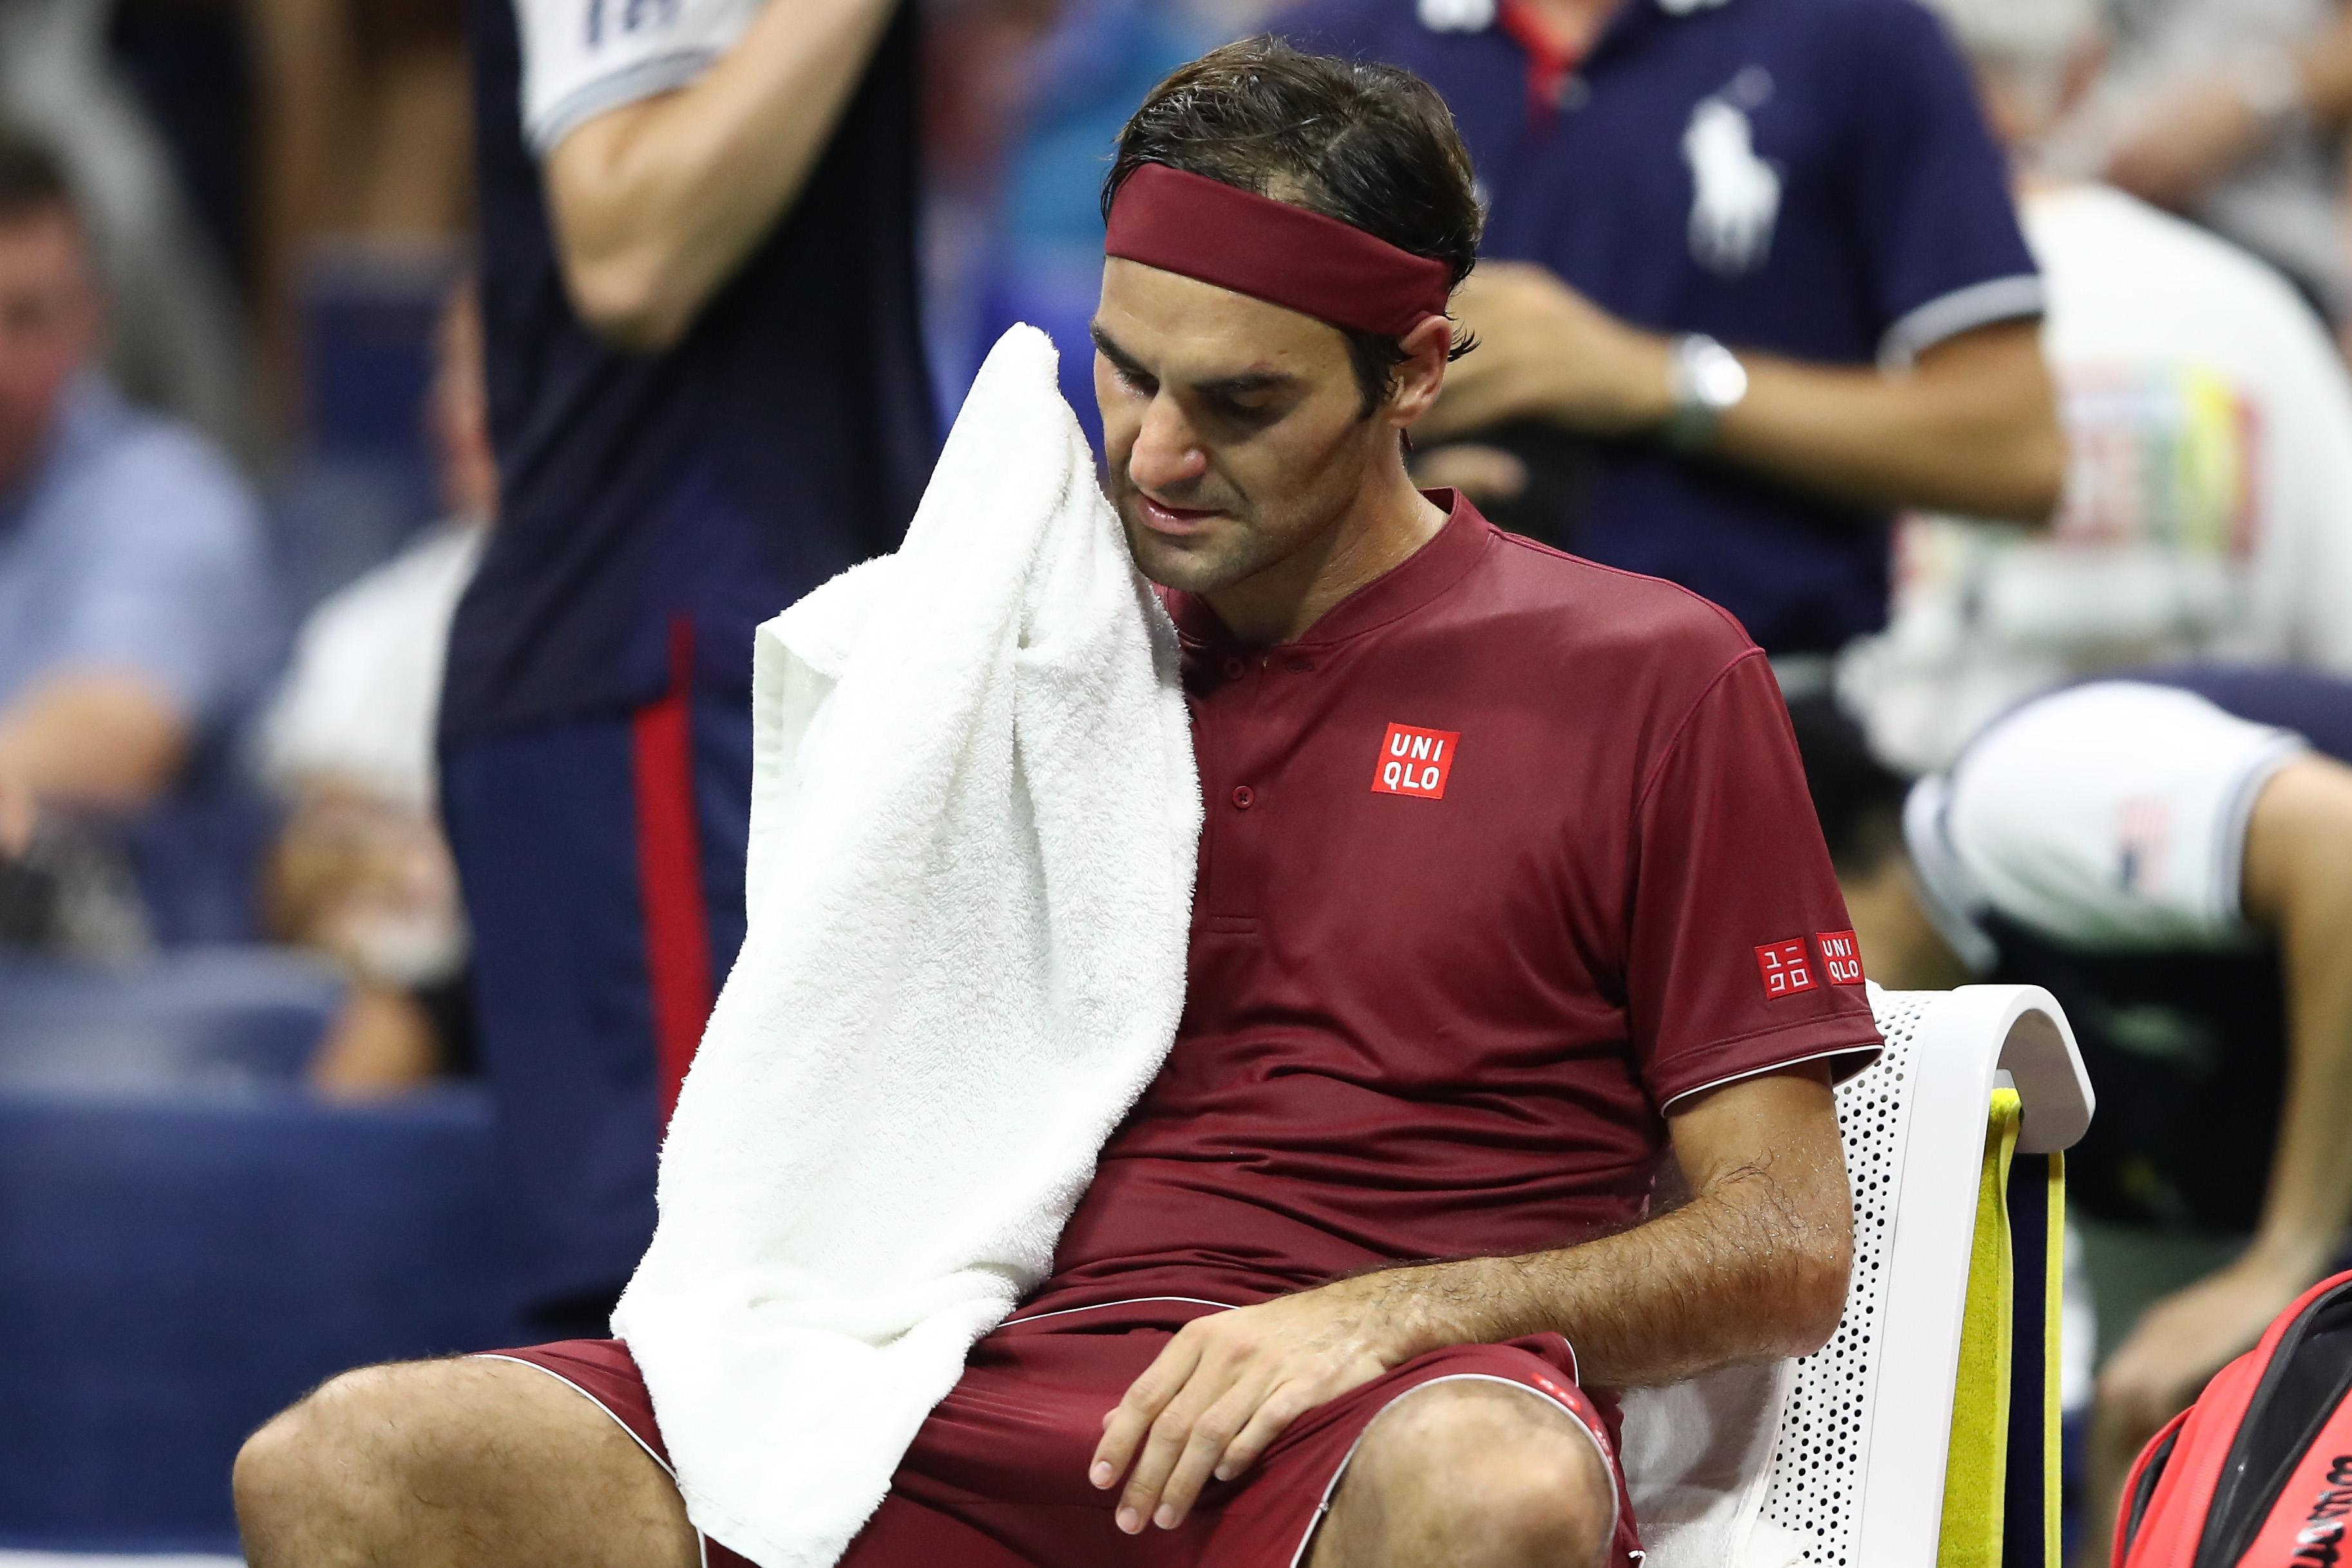 Roger Federer of Switzerland during the men's singles fourth round.